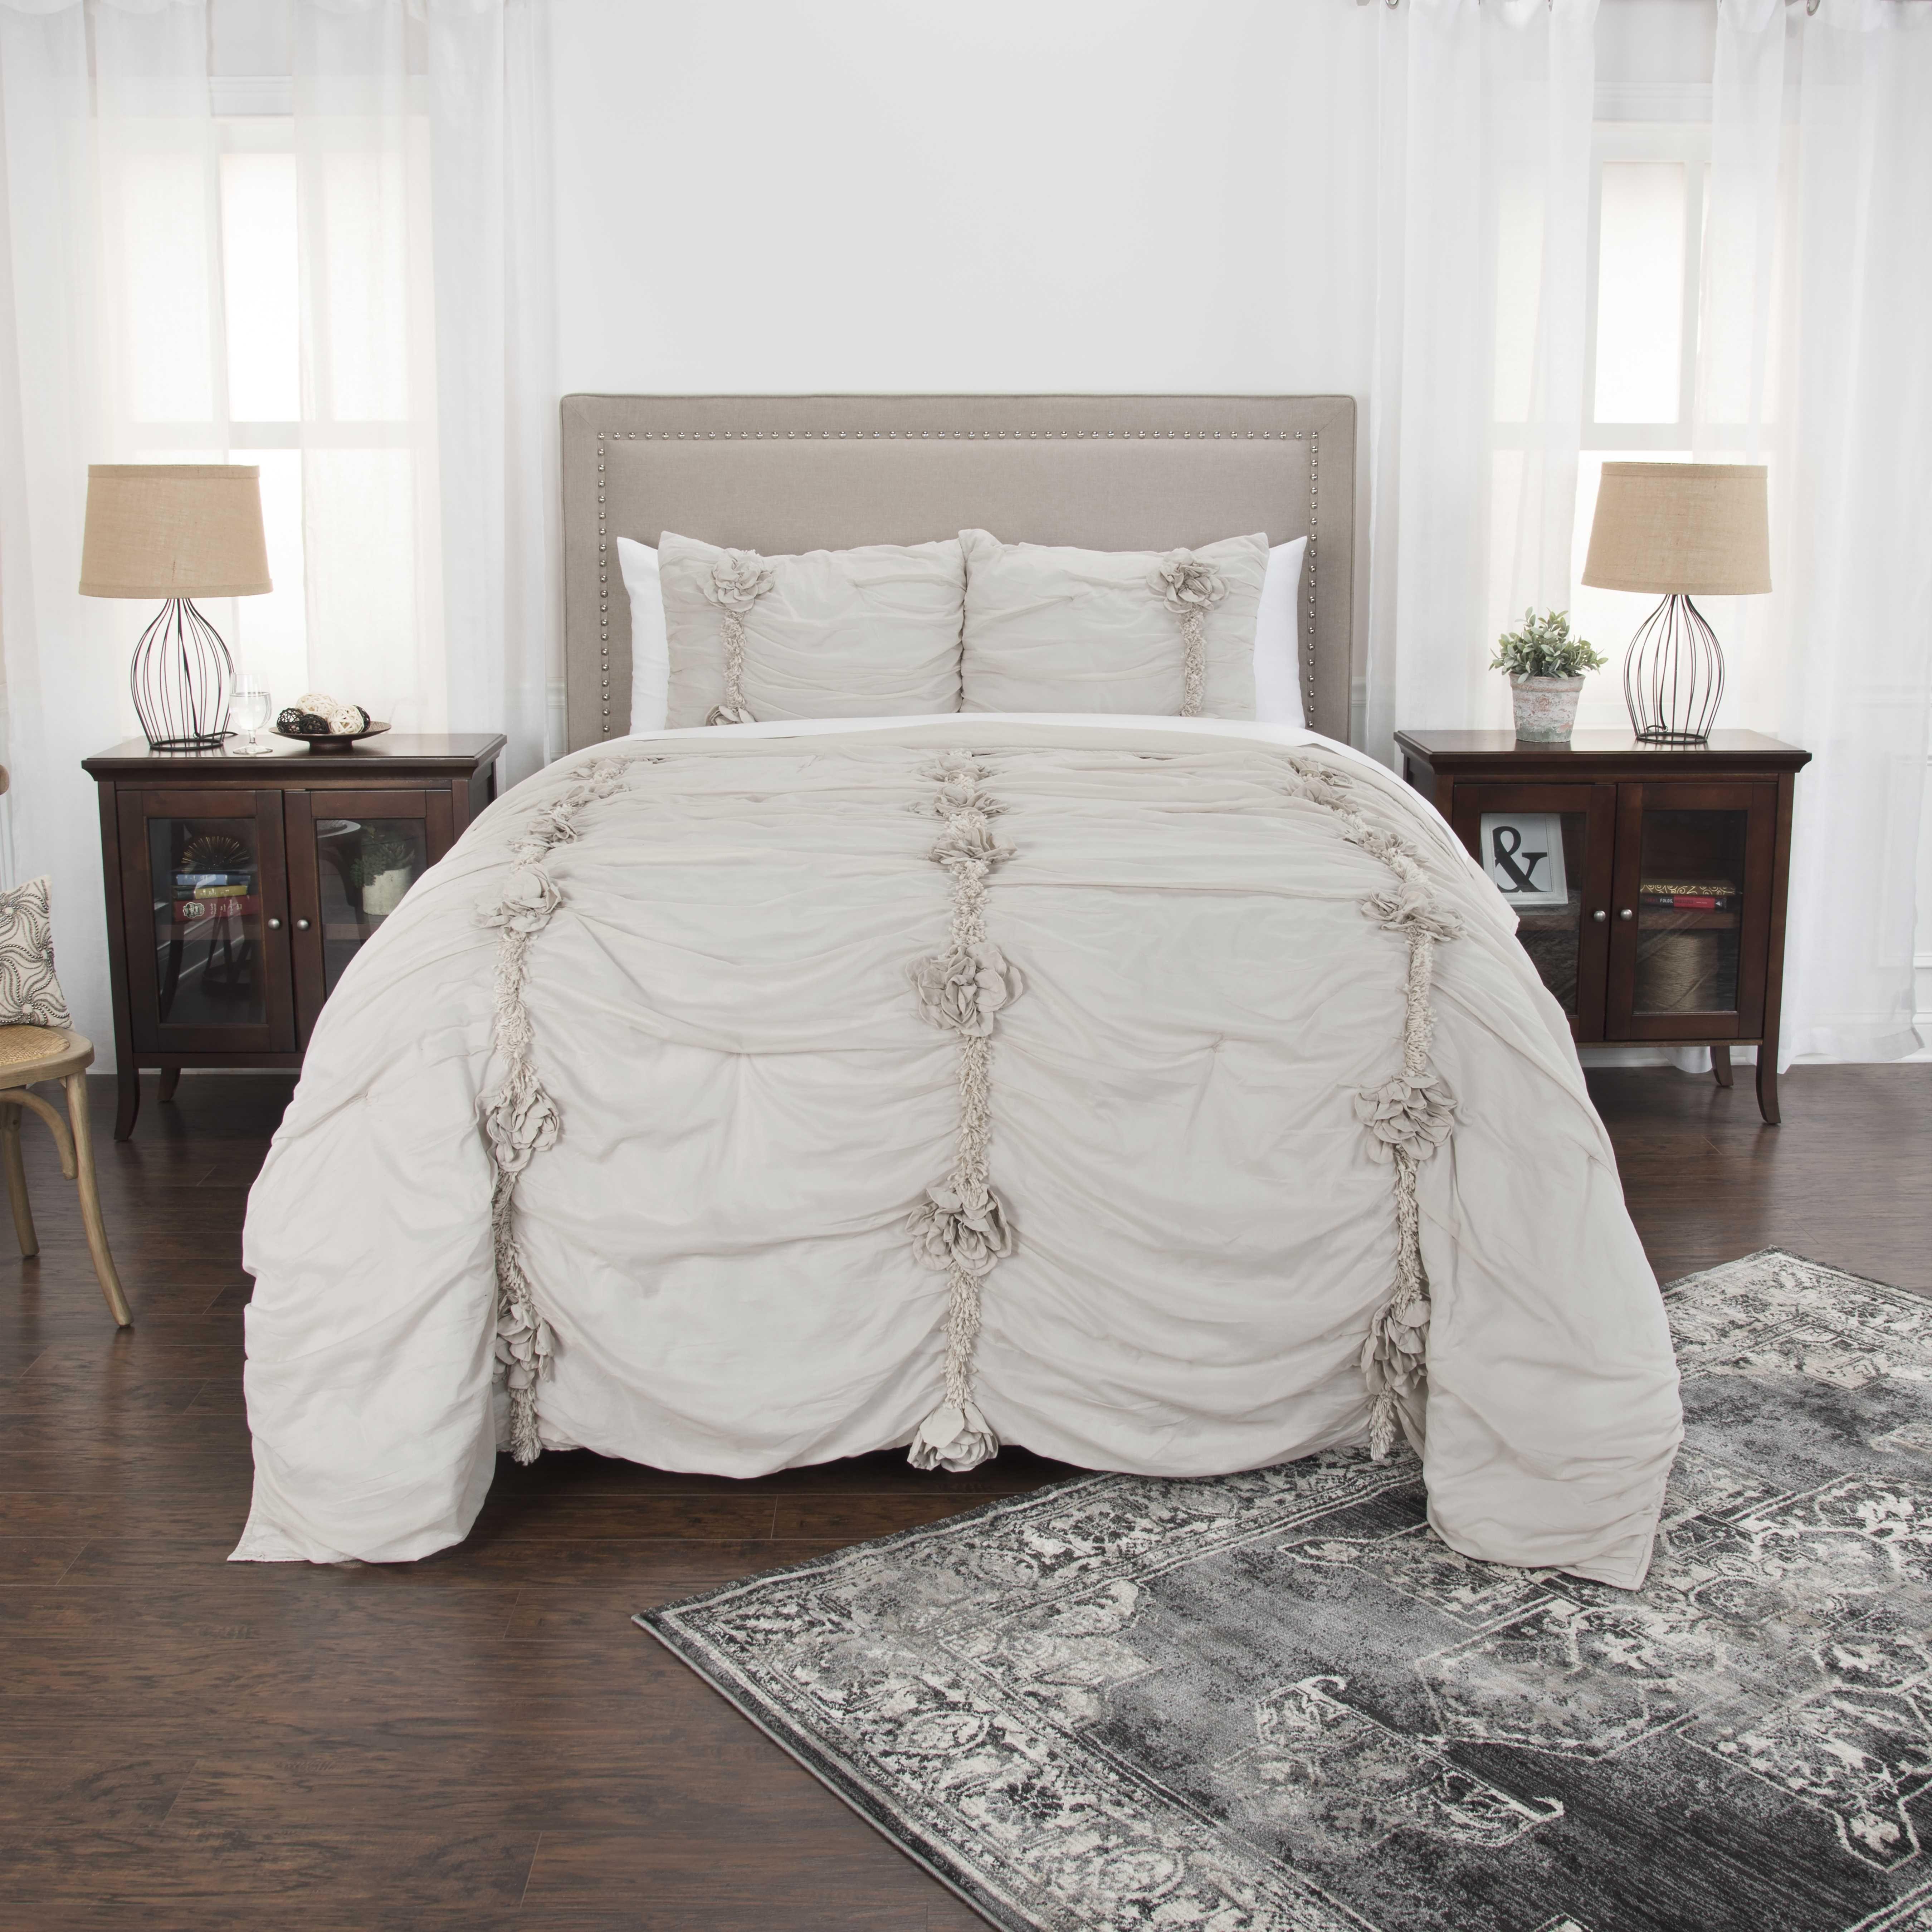 Rizzy Home Cotton 20 X26 Natural Stripe Bedding Sham Striped